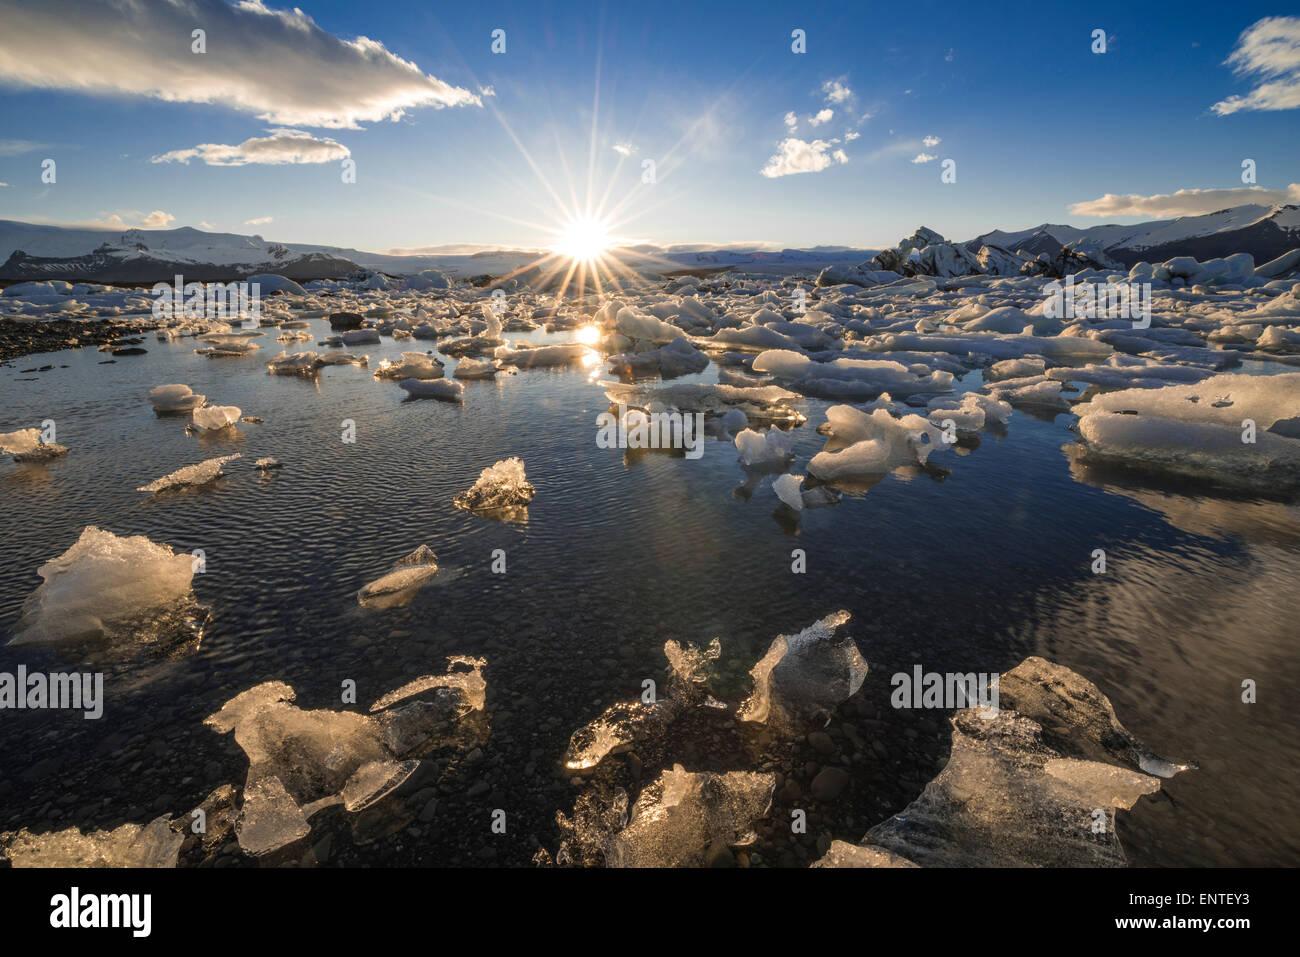 L'Islande Jokulsarlon, lagon, Parc national du Vatnajökull au coucher du soleil Photo Stock